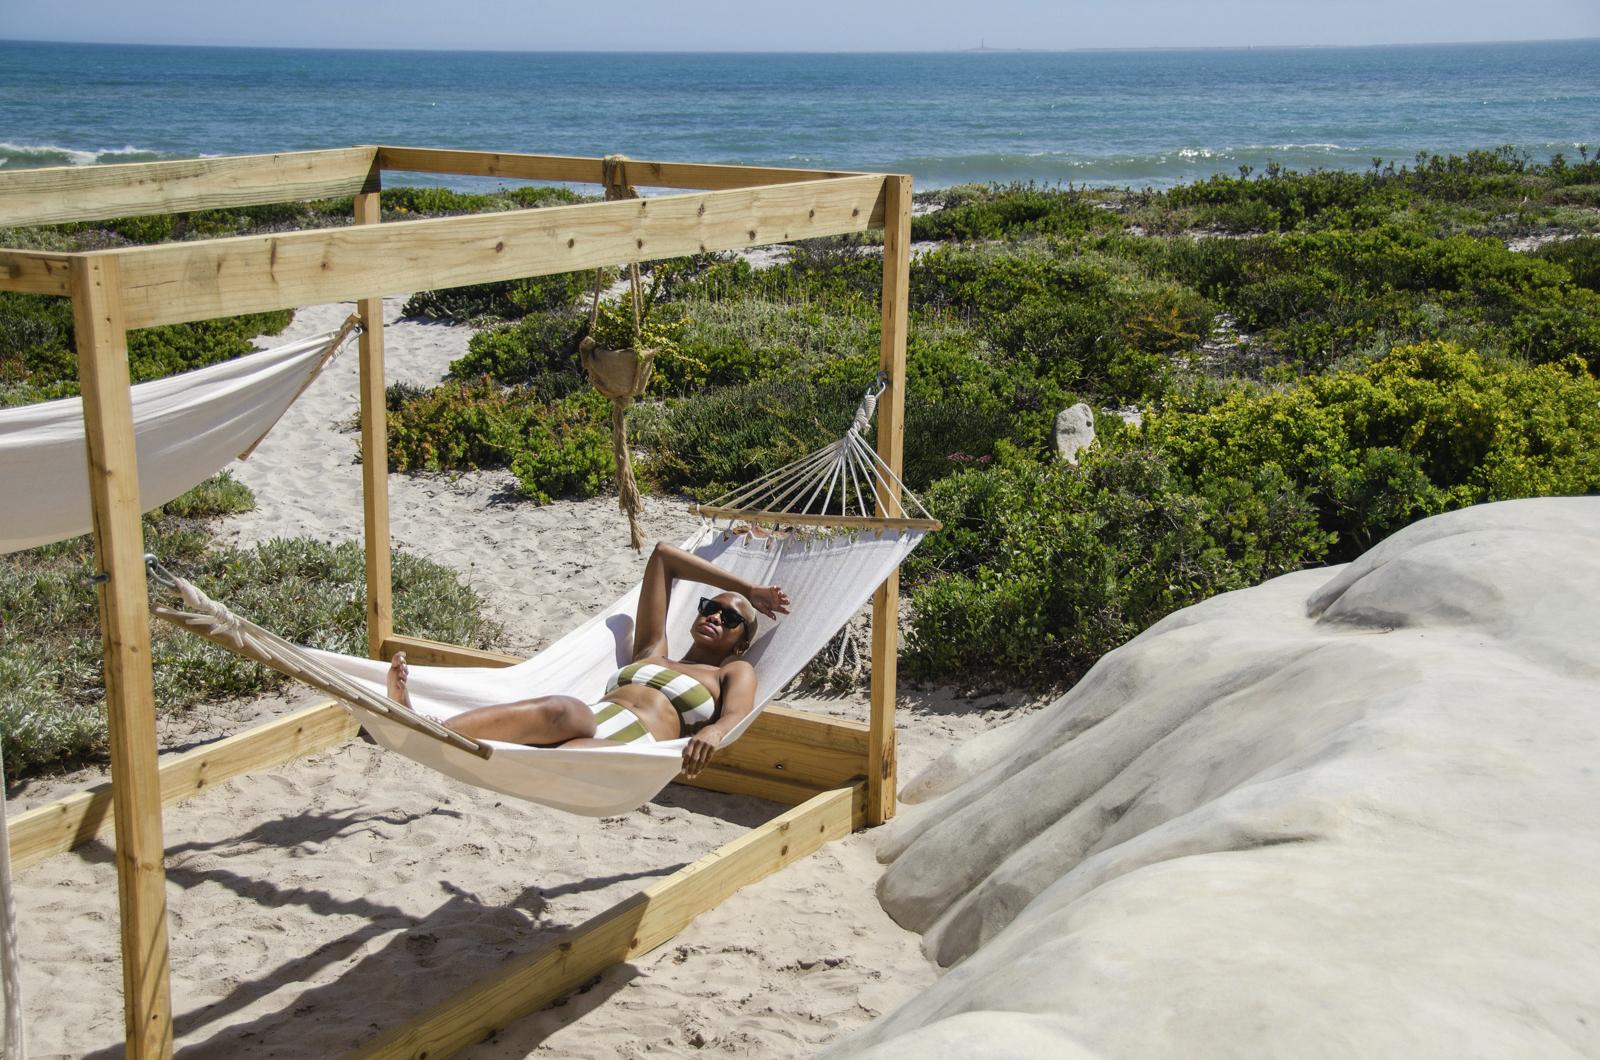 Corona Beer And Twiggy Moli Inspire Summer Getaway Vibes On MTV Base Series photo